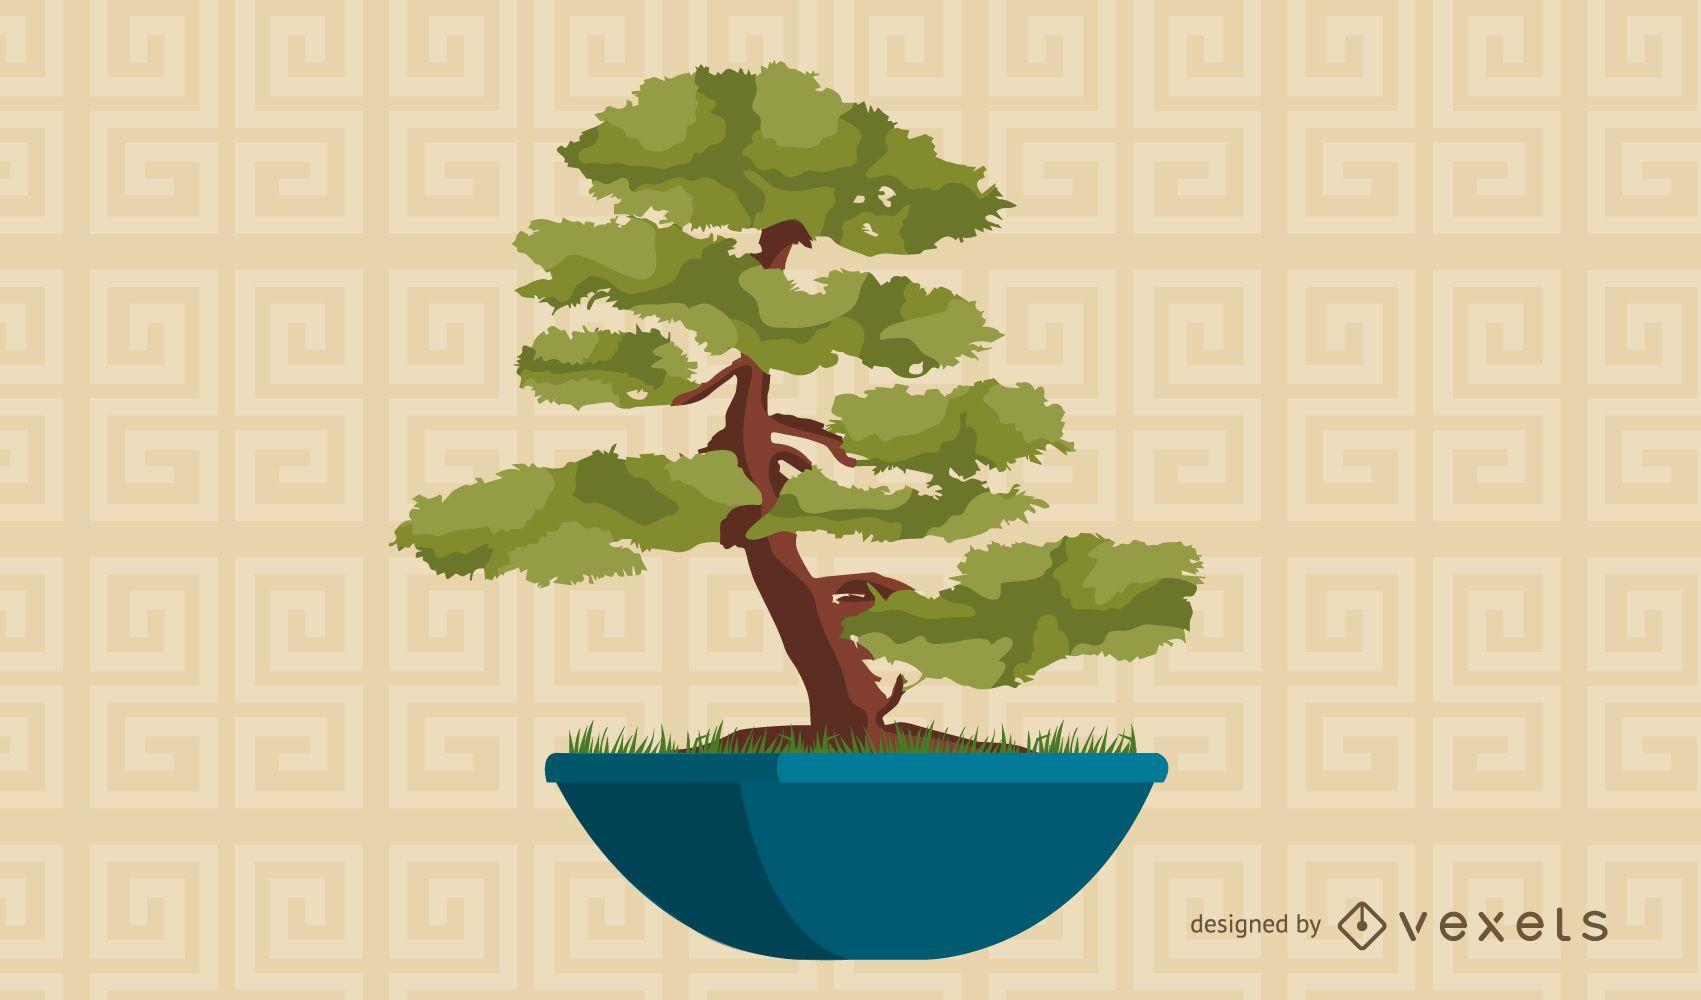 Ilustraci?n de ?rbol bonsai asi?tico